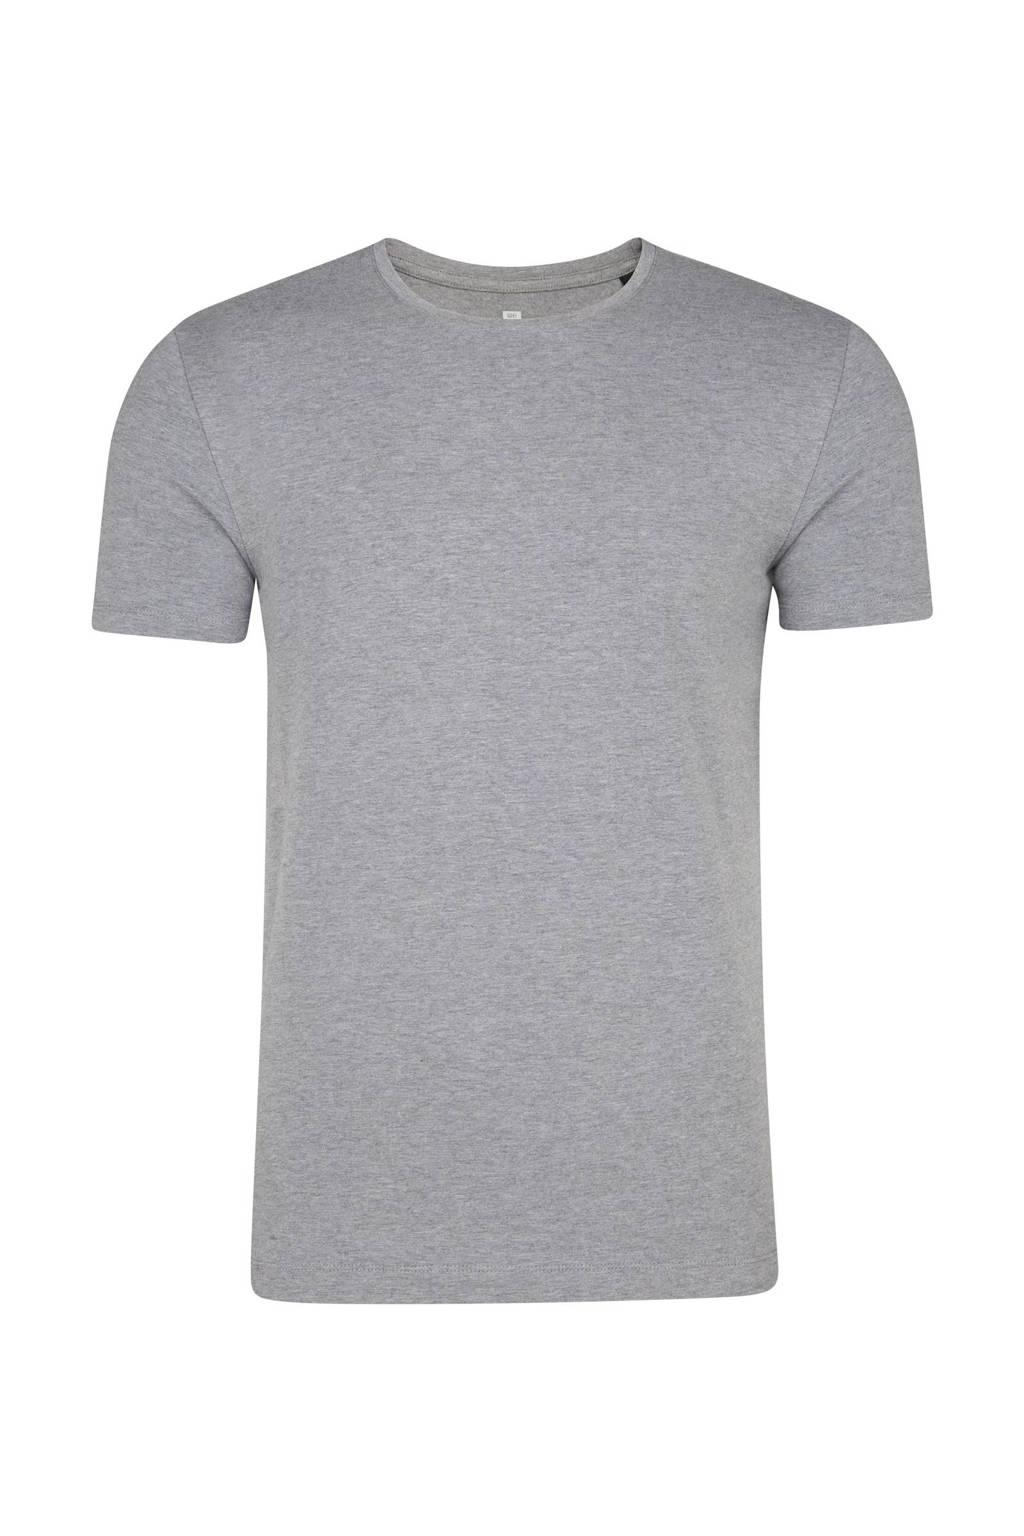 WE Fashion T-shirt, Light Grey Melange